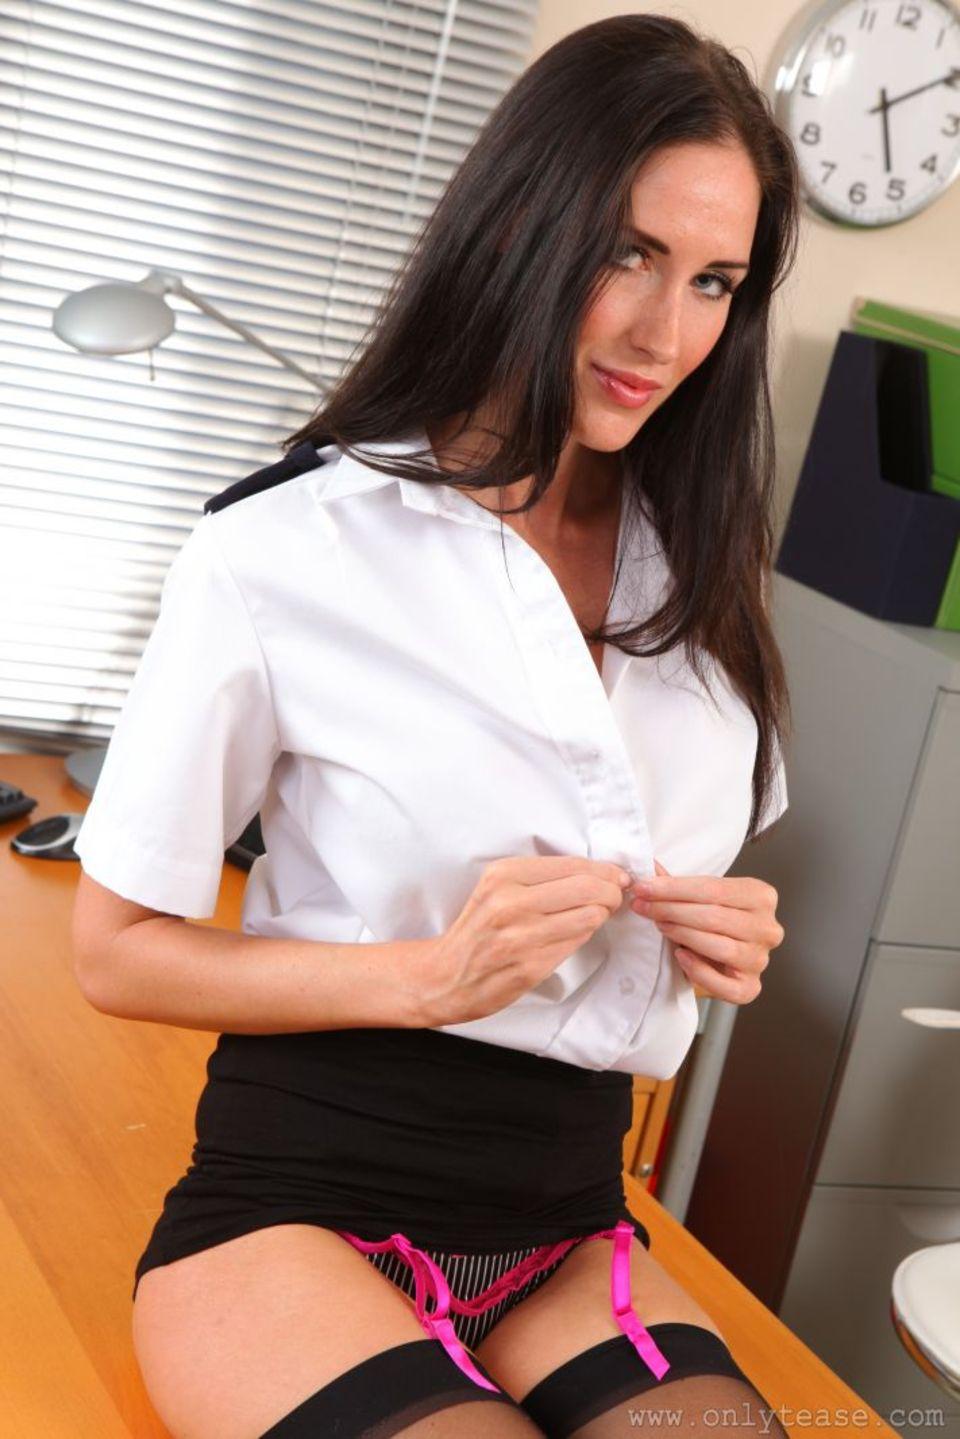 Сотрудница полиции порно 7 фотография